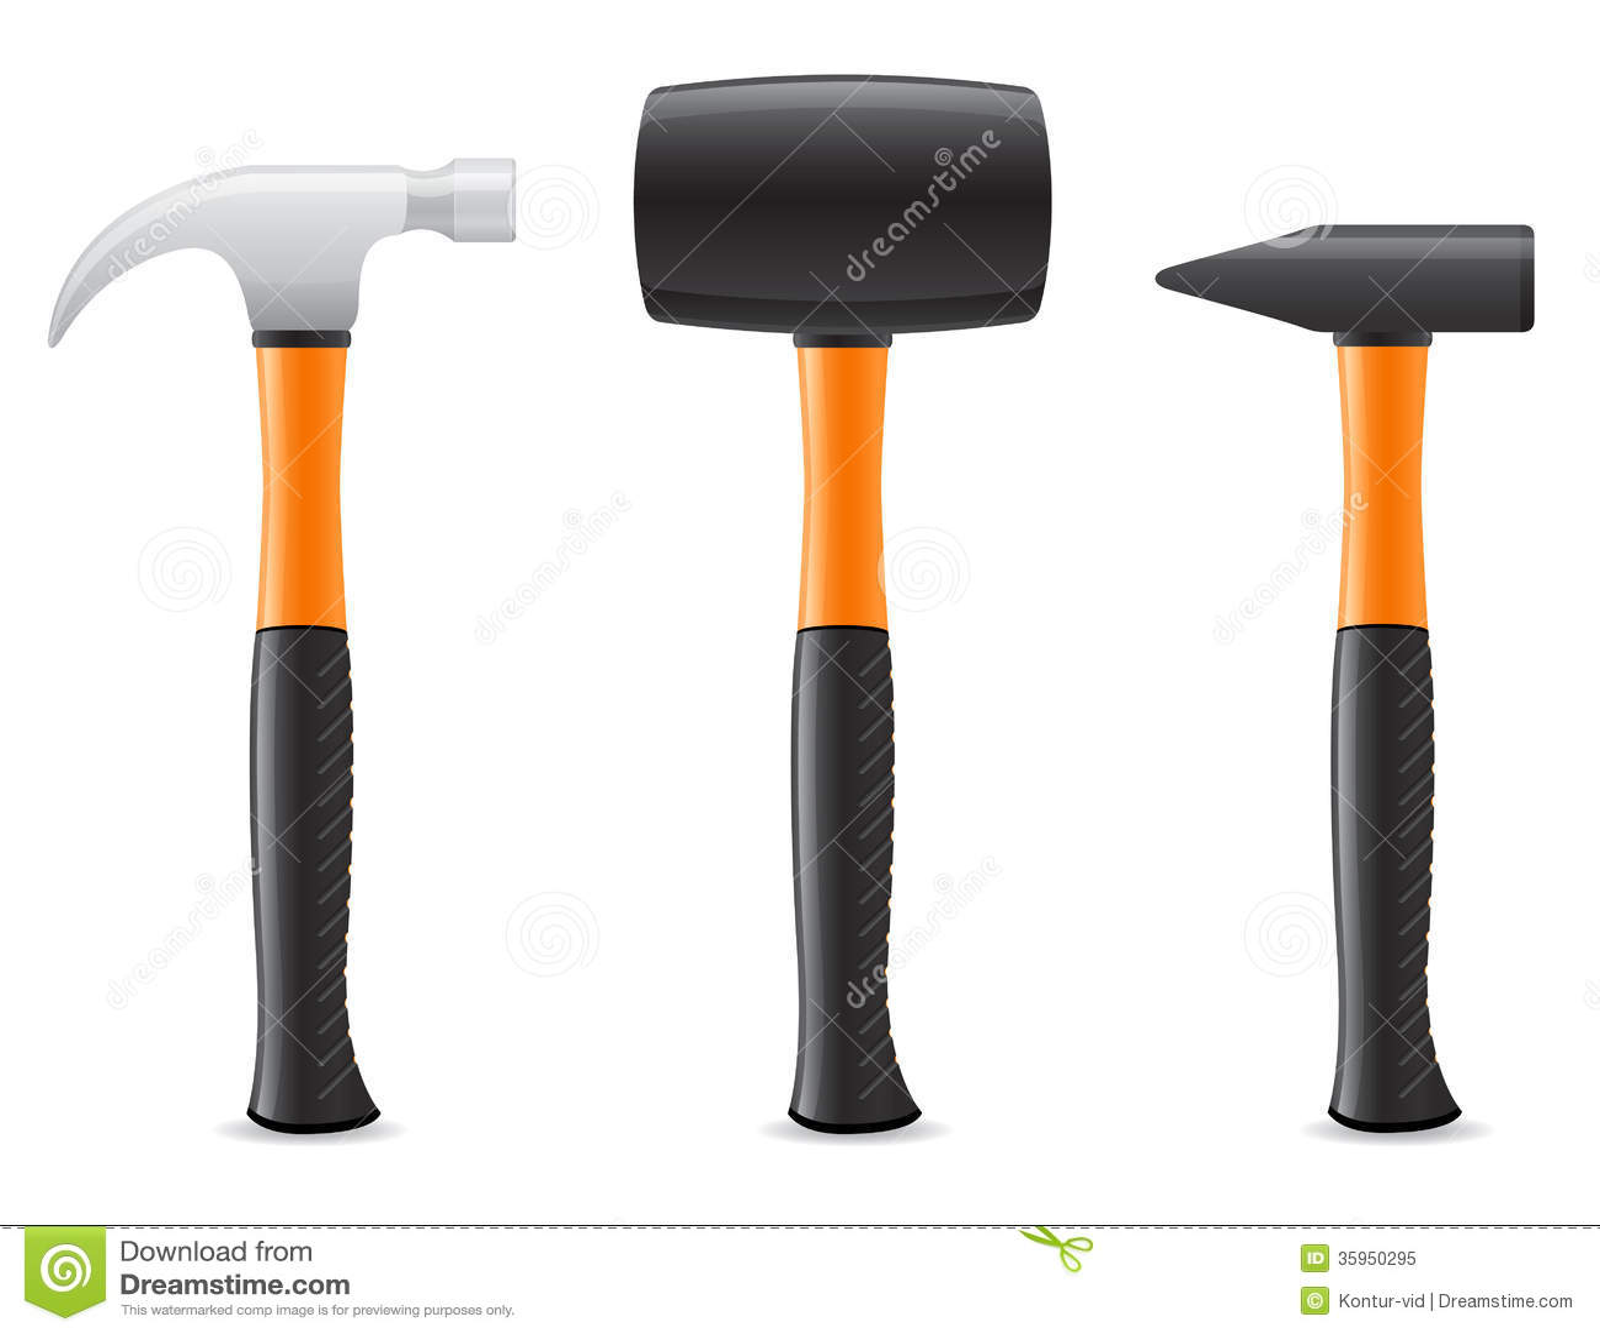 Vector Illustration Hammer: Tool Hammer With Plastic Handle Vector Illustratio Stock